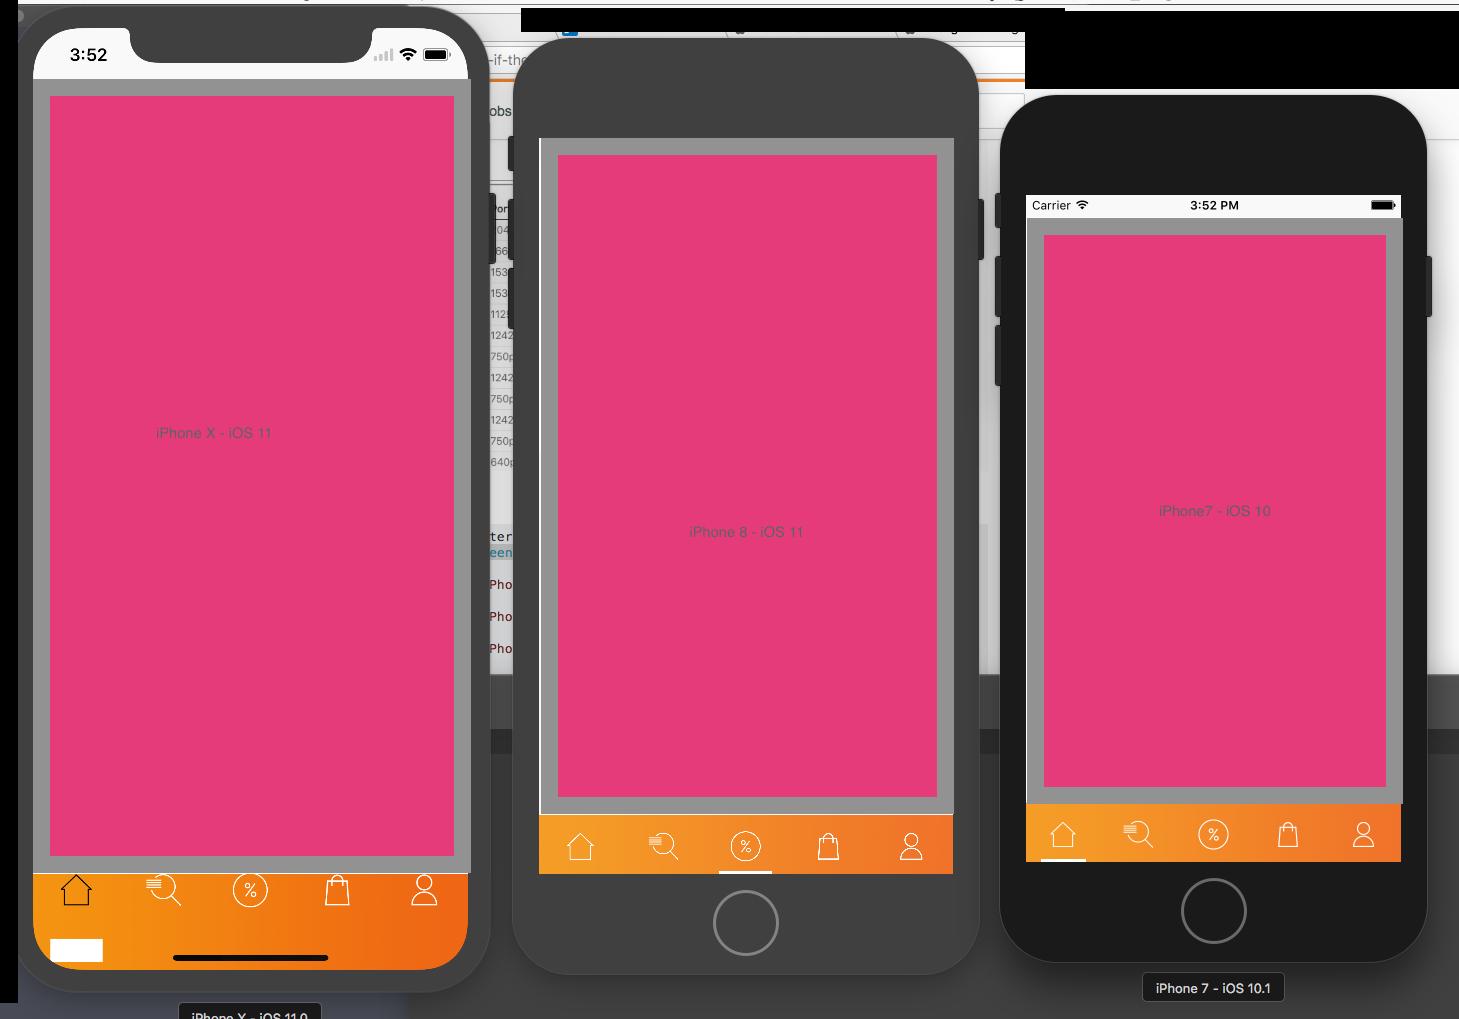 iPhone X, iOS 11 - Tabbar Background — Xamarin Community Forums